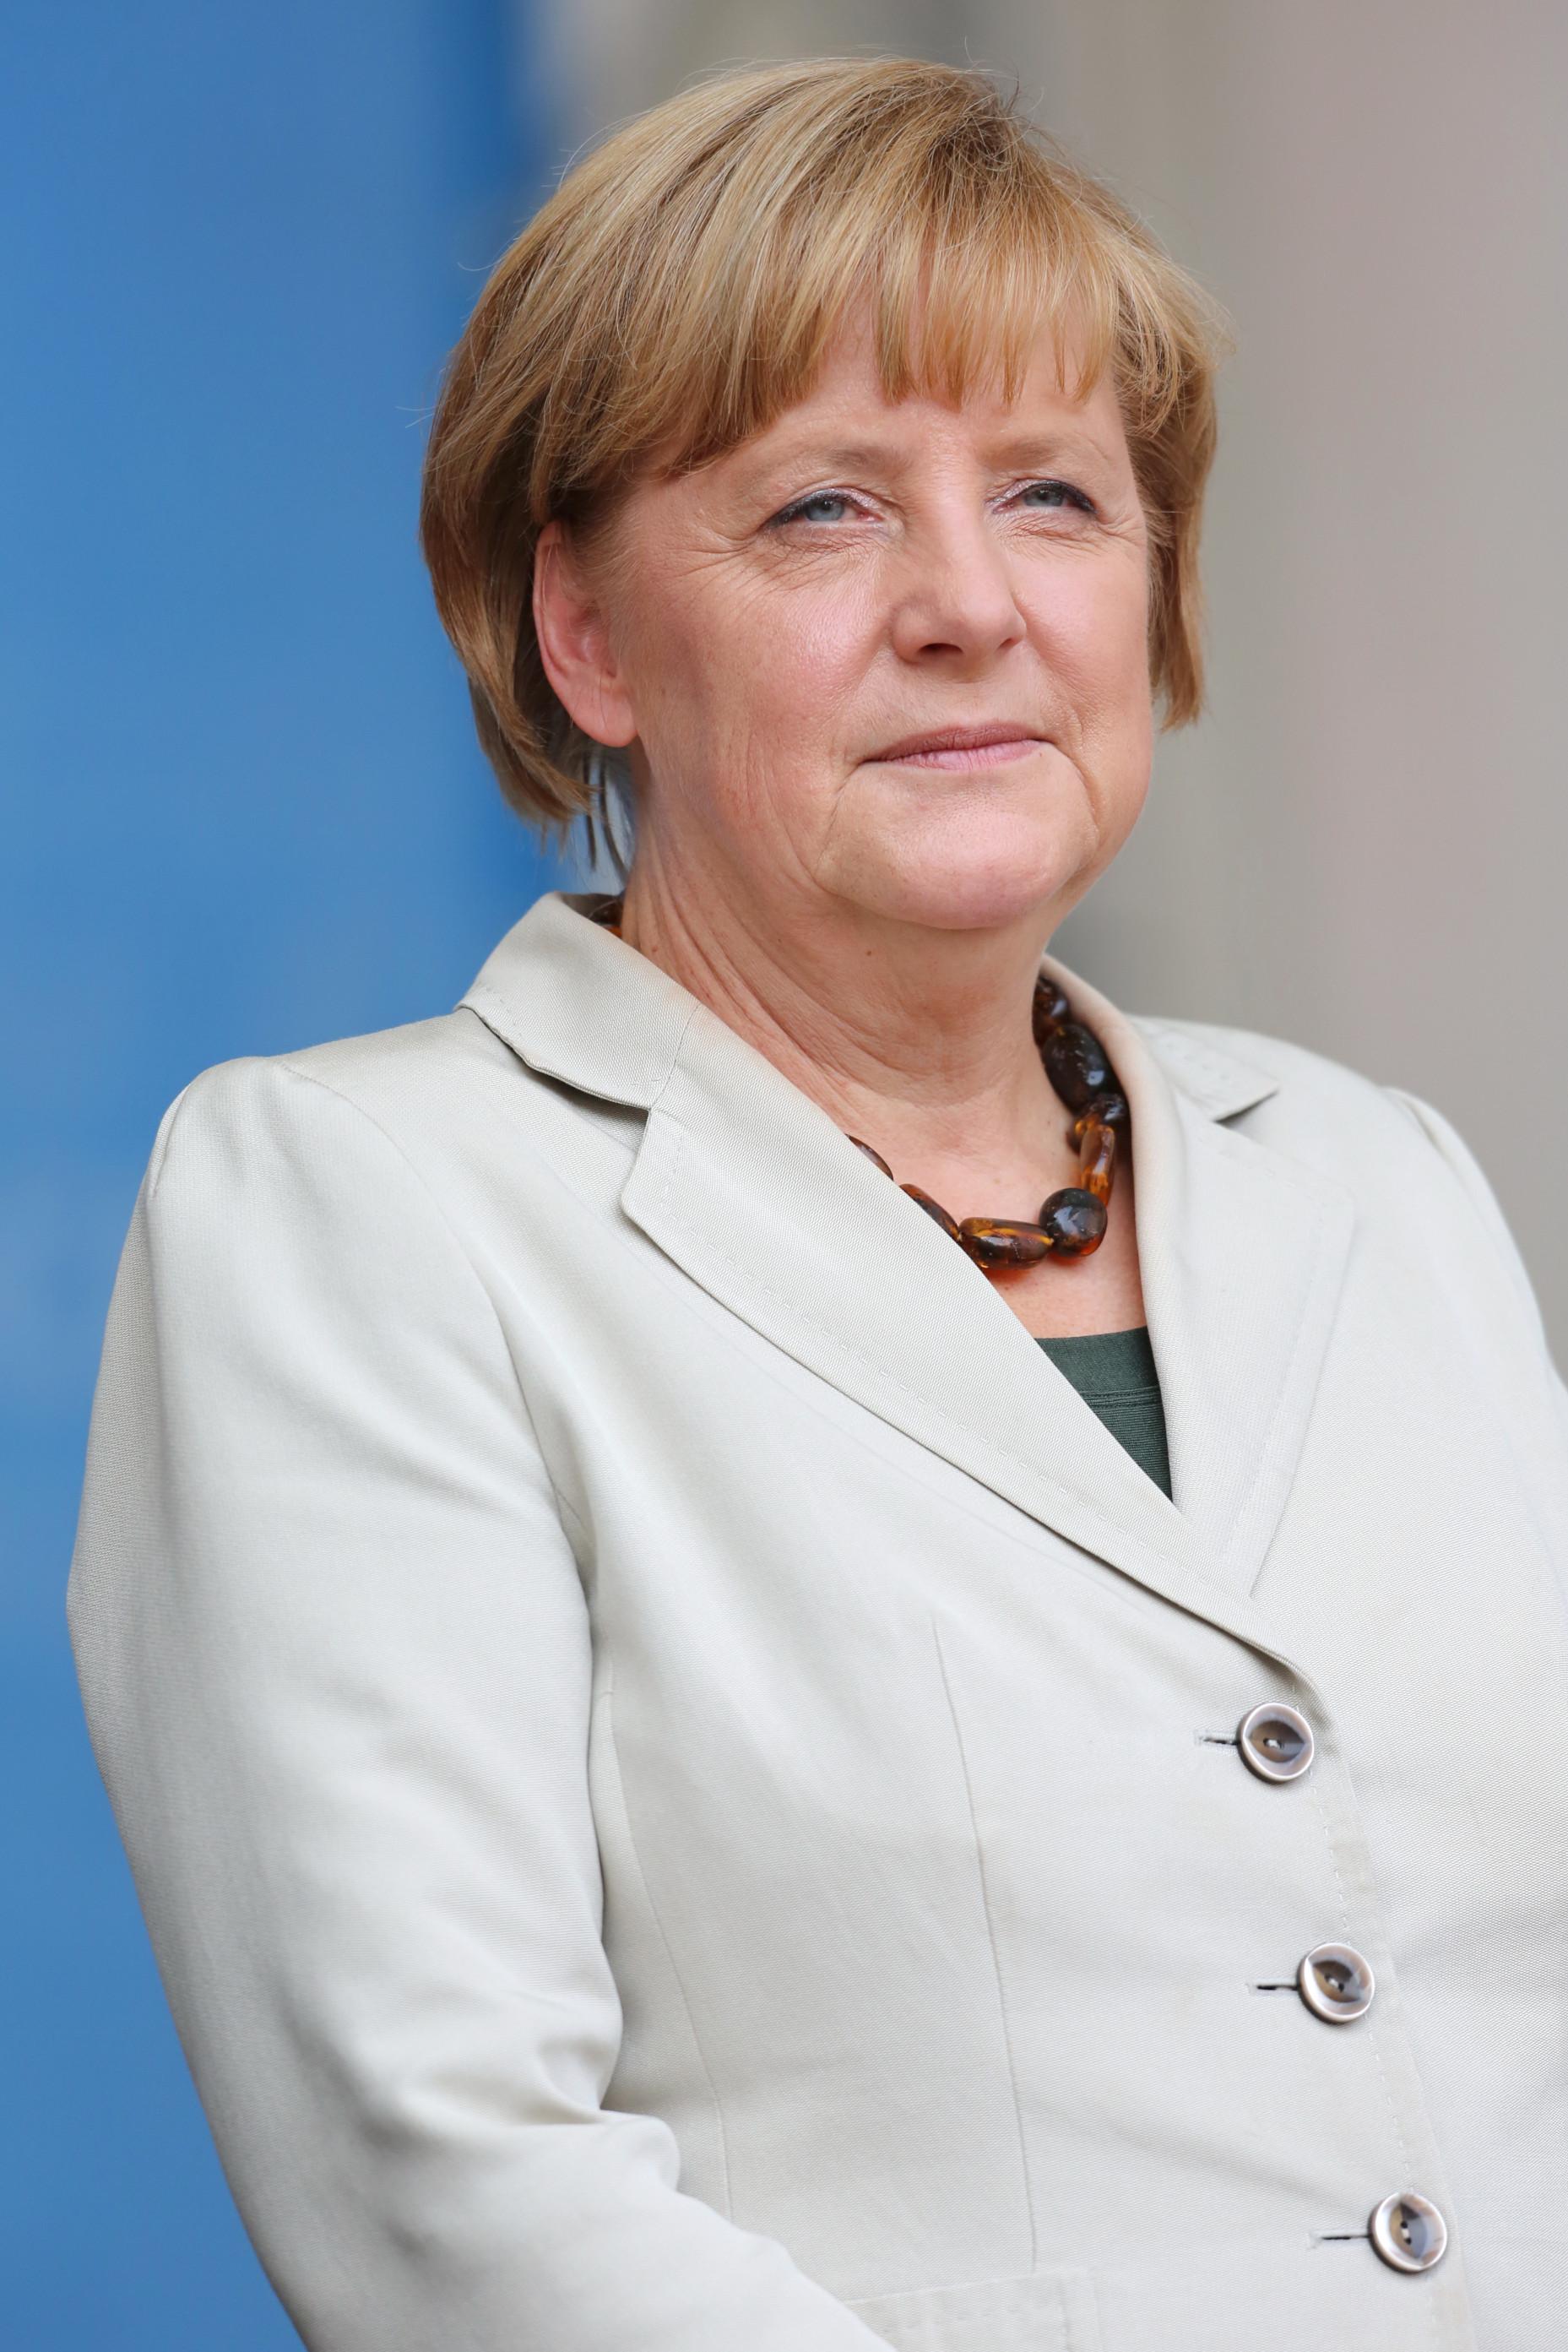 Bundeskanzlerin - Angela-Merkel-Portrait